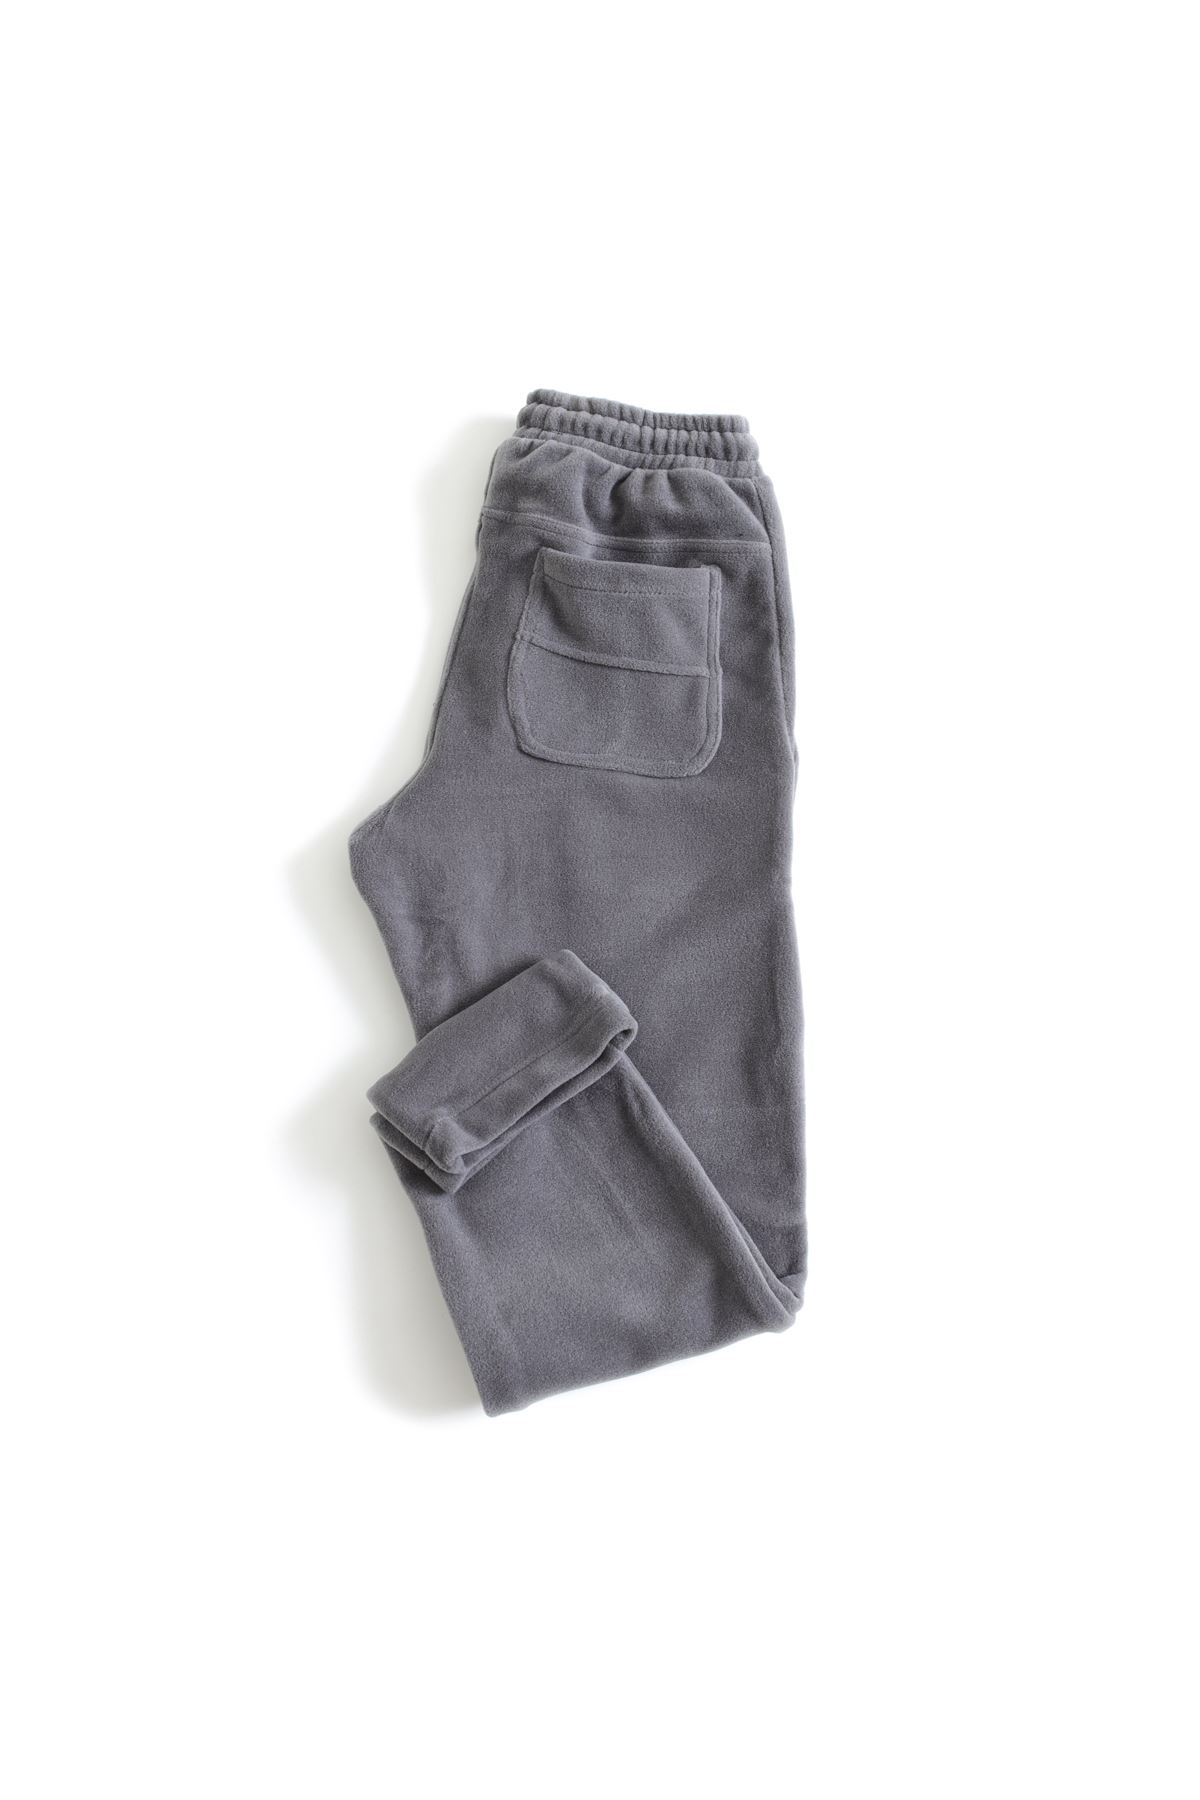 Koyu Gri Polar Jogger Pantolon